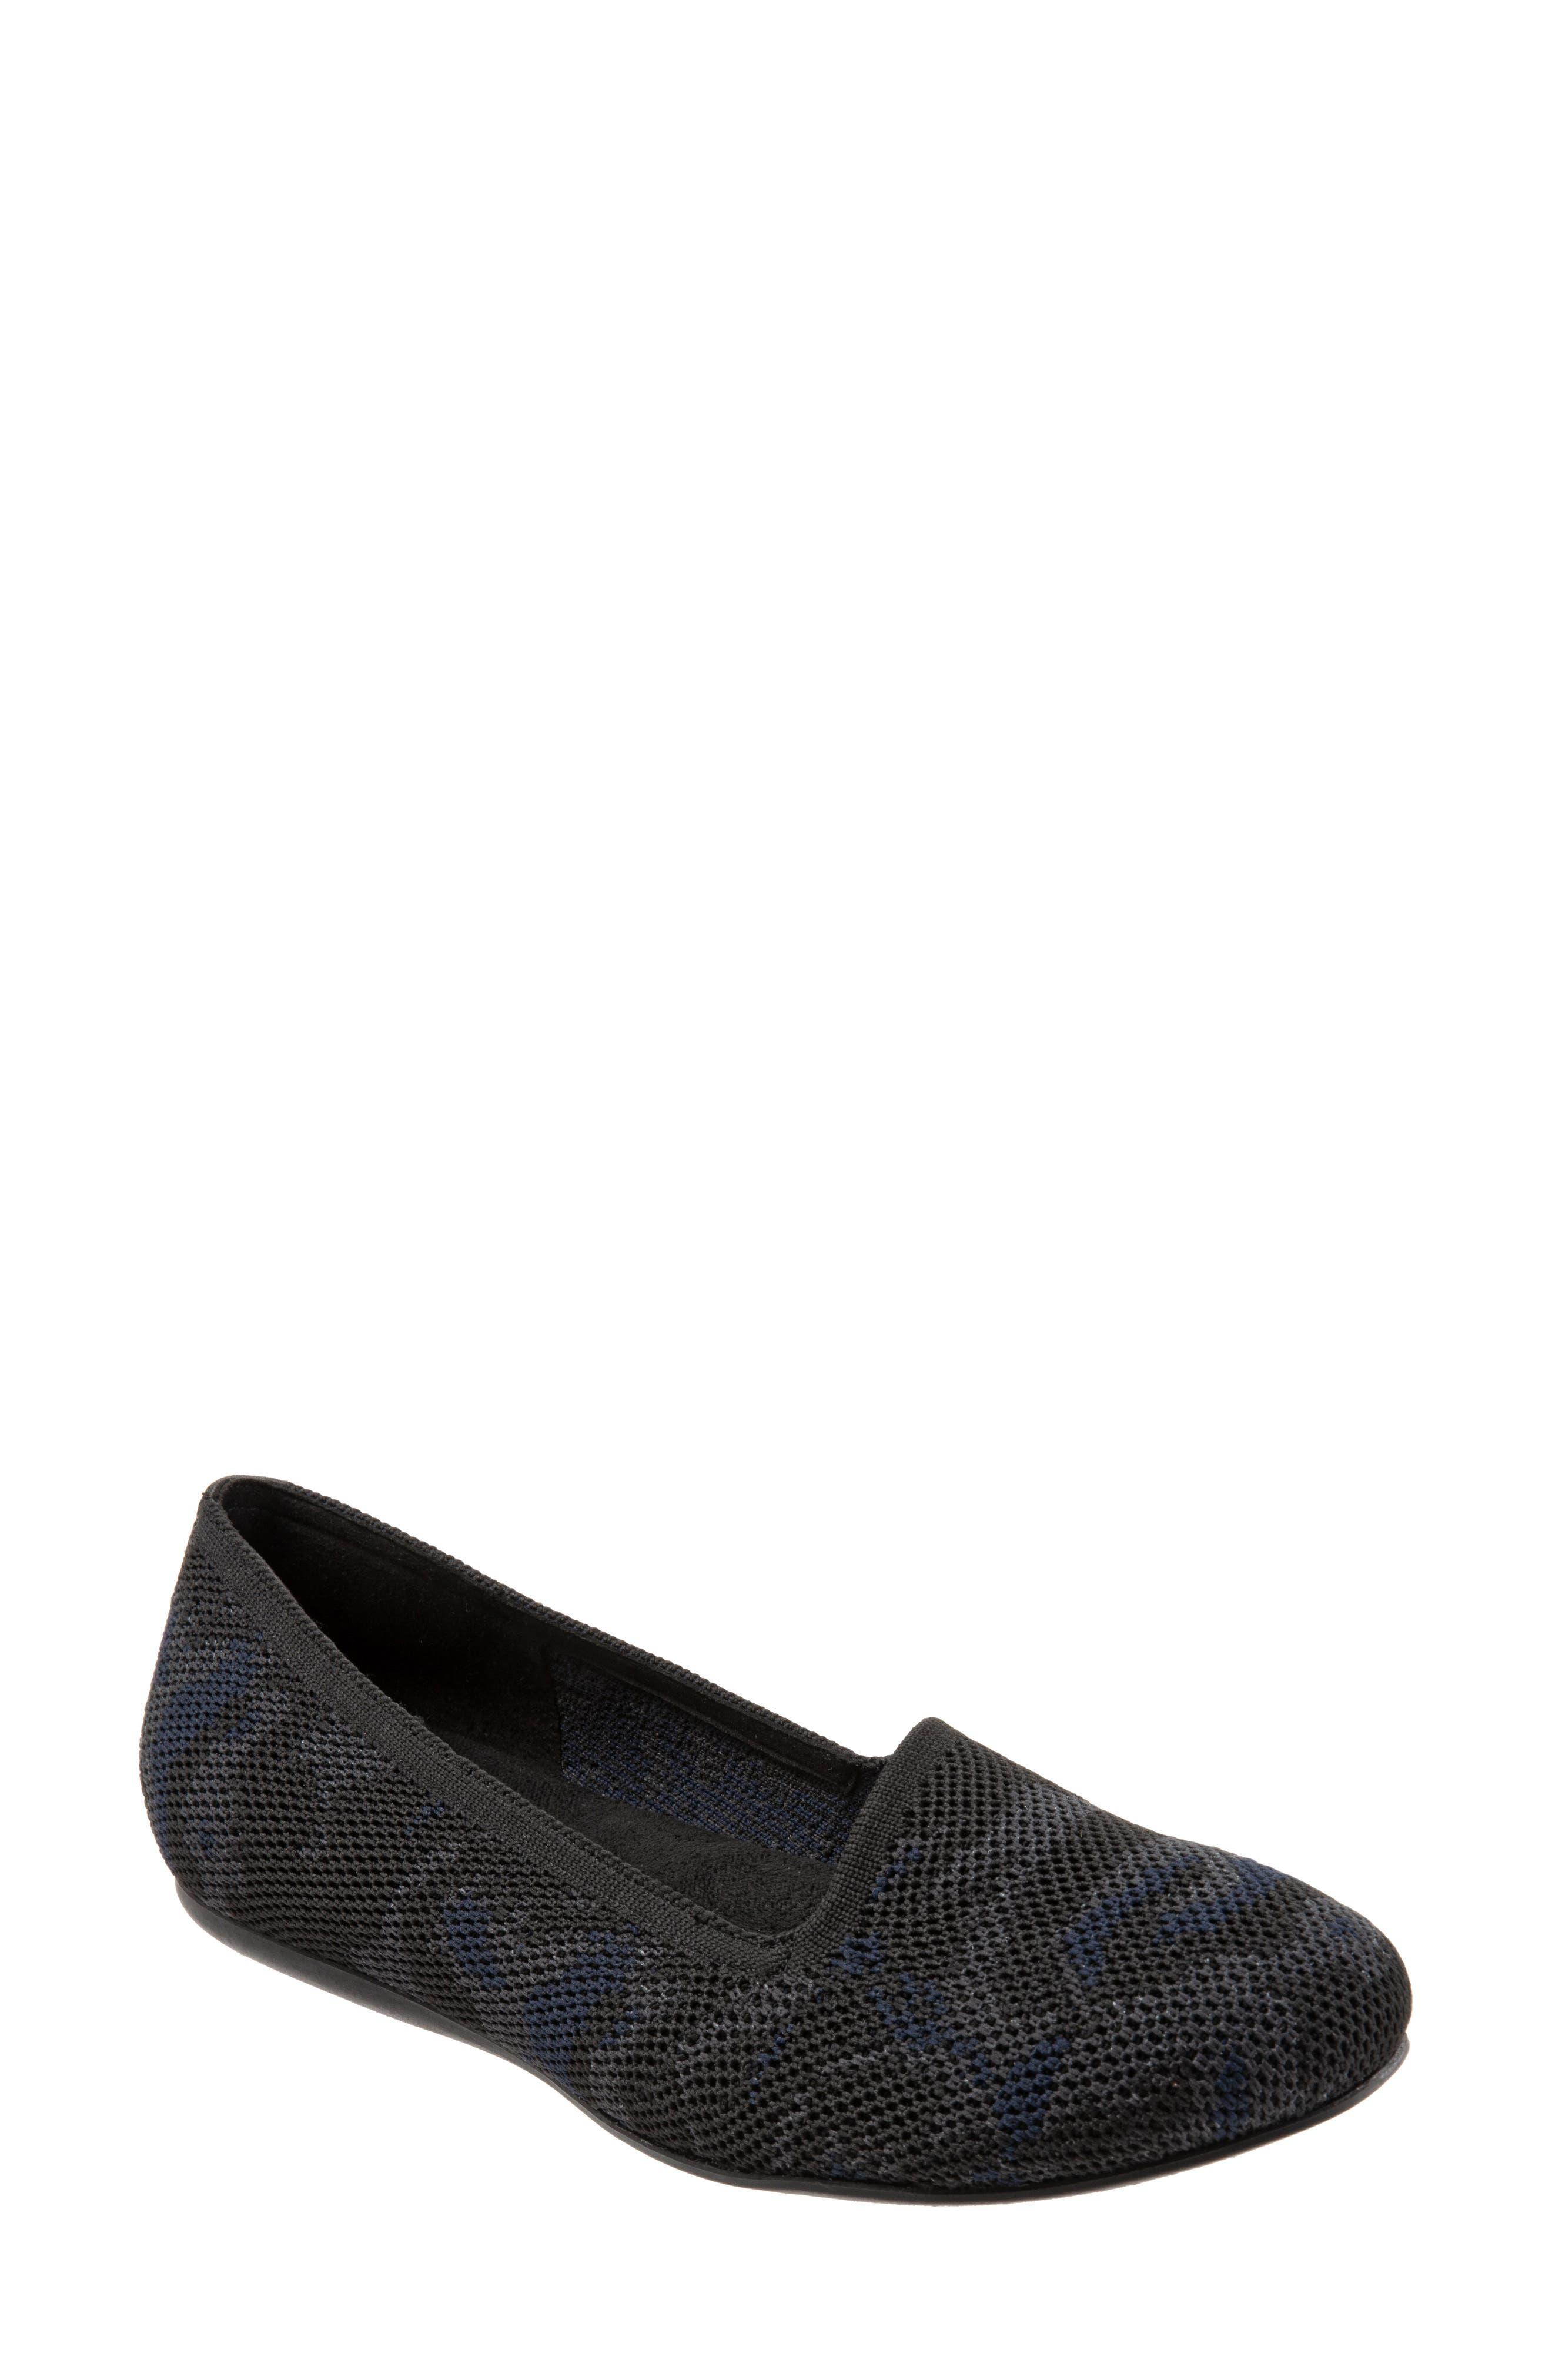 SOFTWALK<SUP>®</SUP> Sicily Knit Flat, Main, color, BLACK/ GREY FABRIC